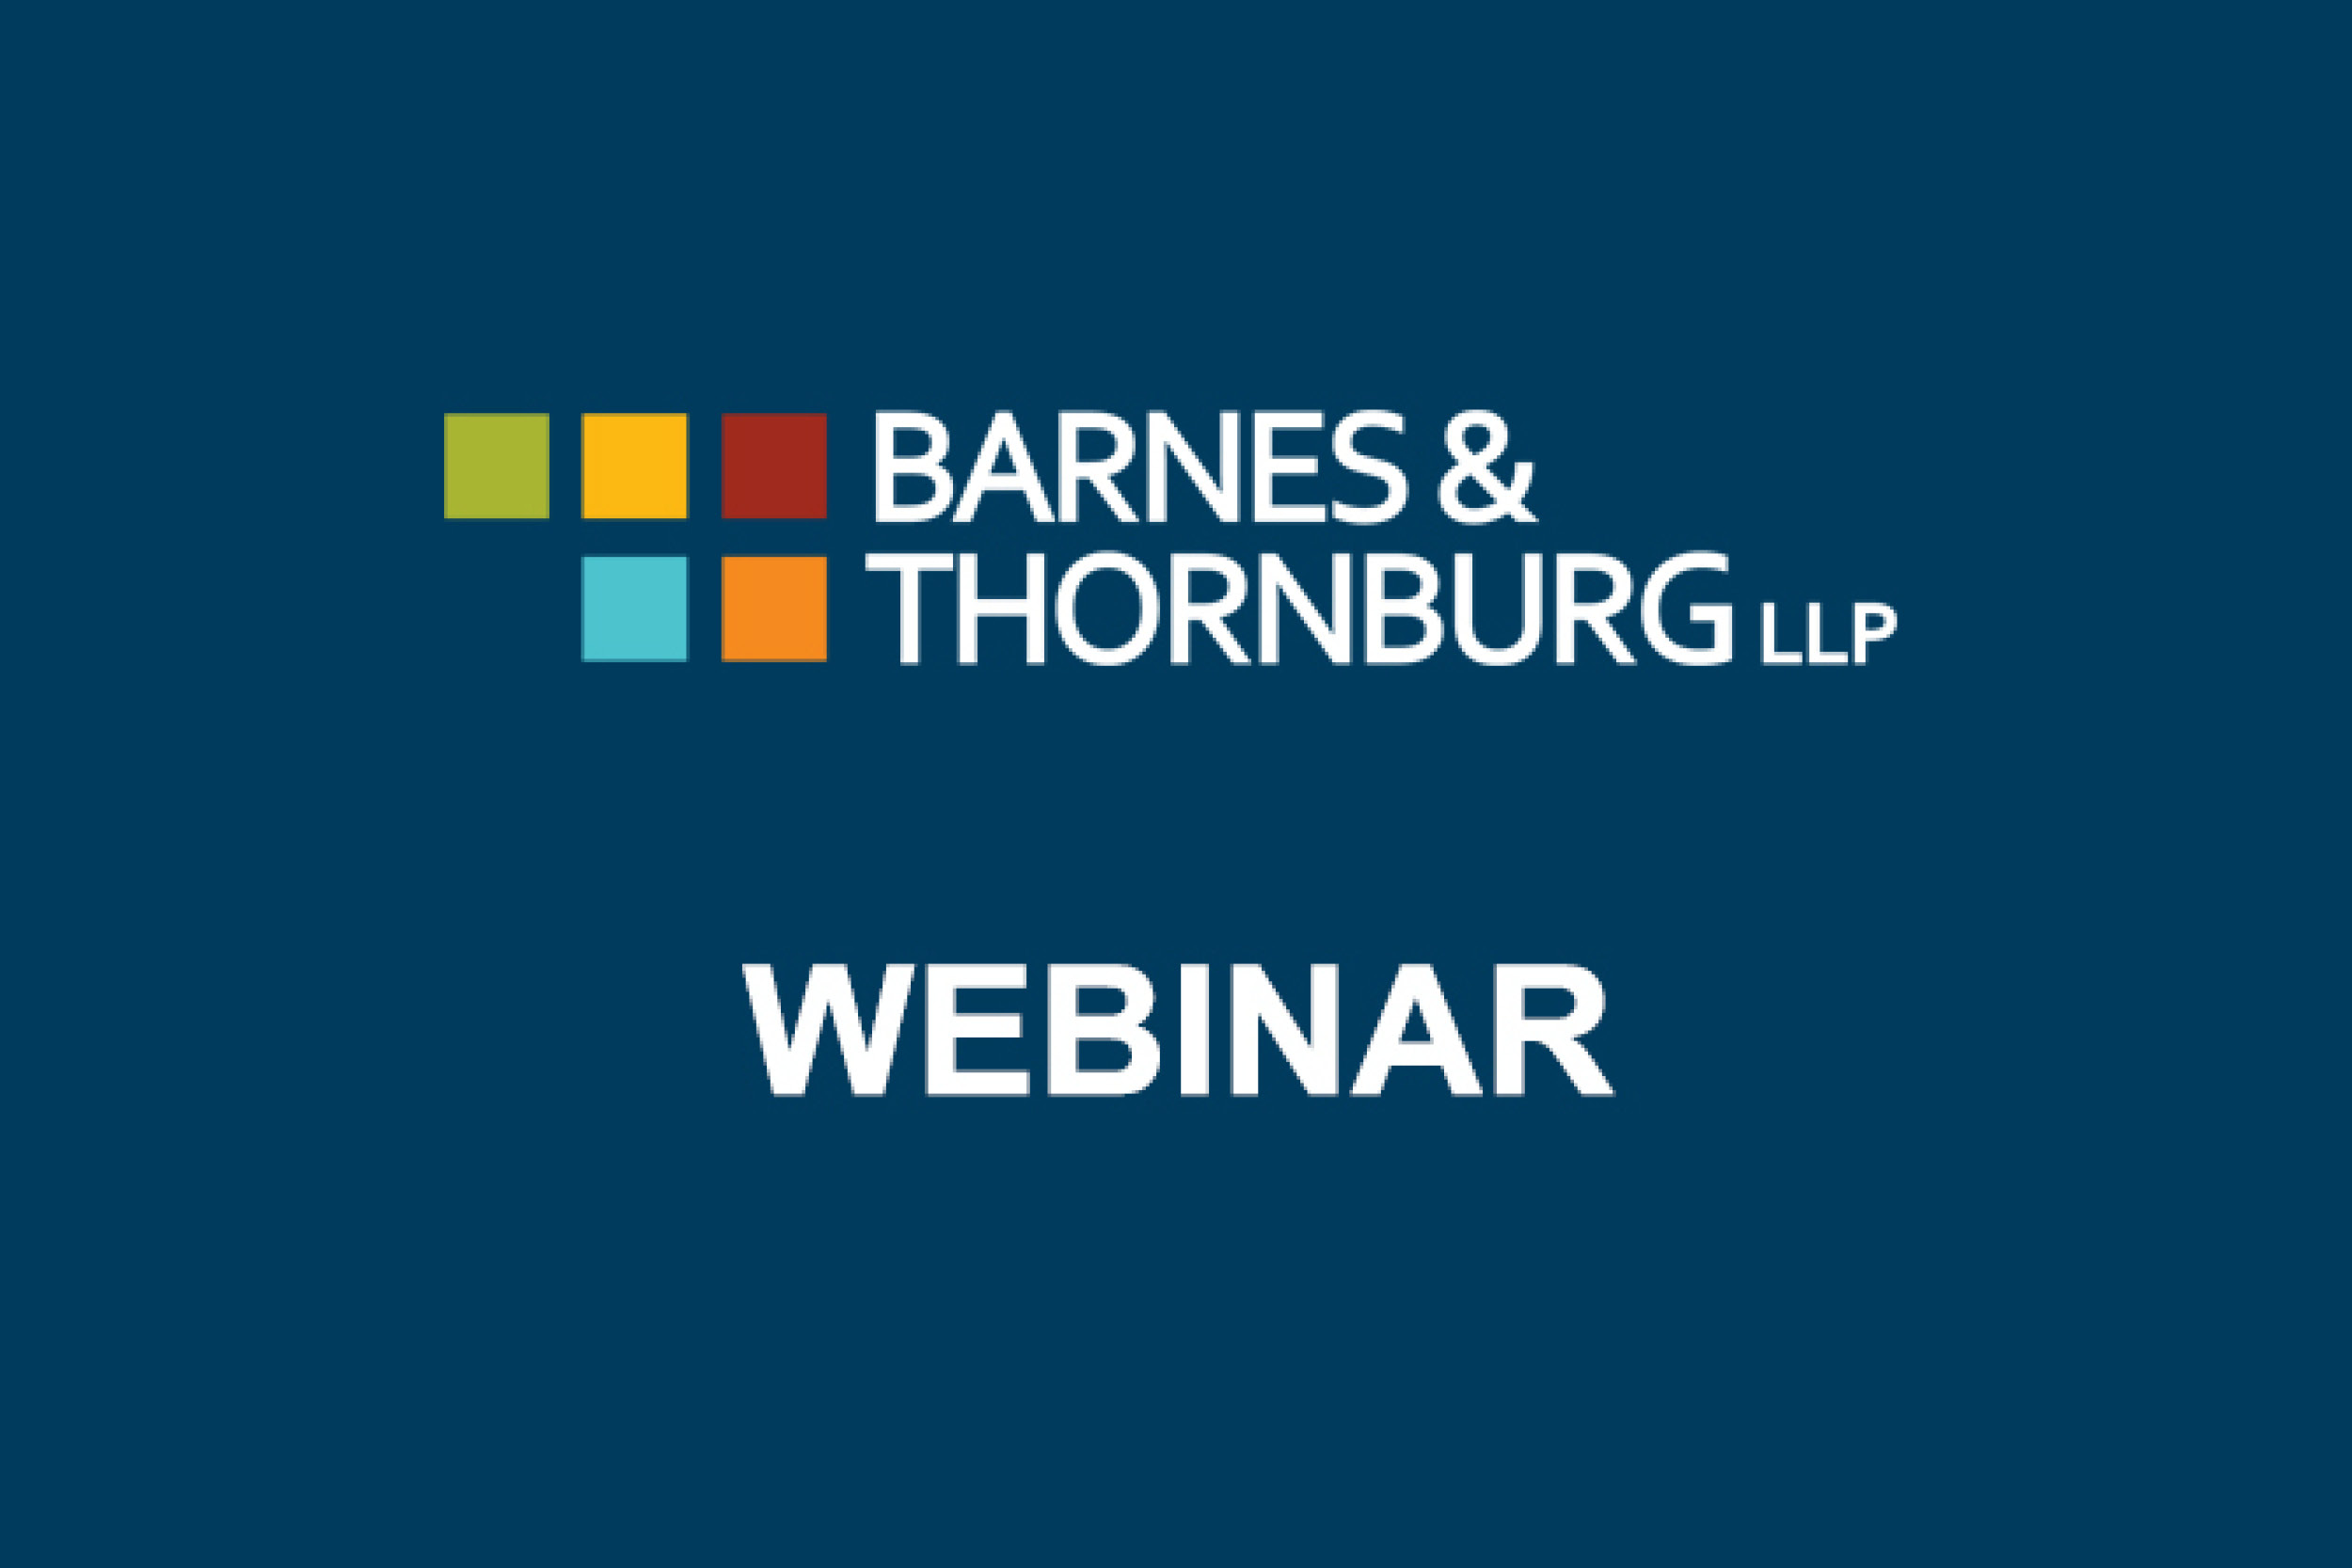 Barnes & Thornburg Webinar Graphic